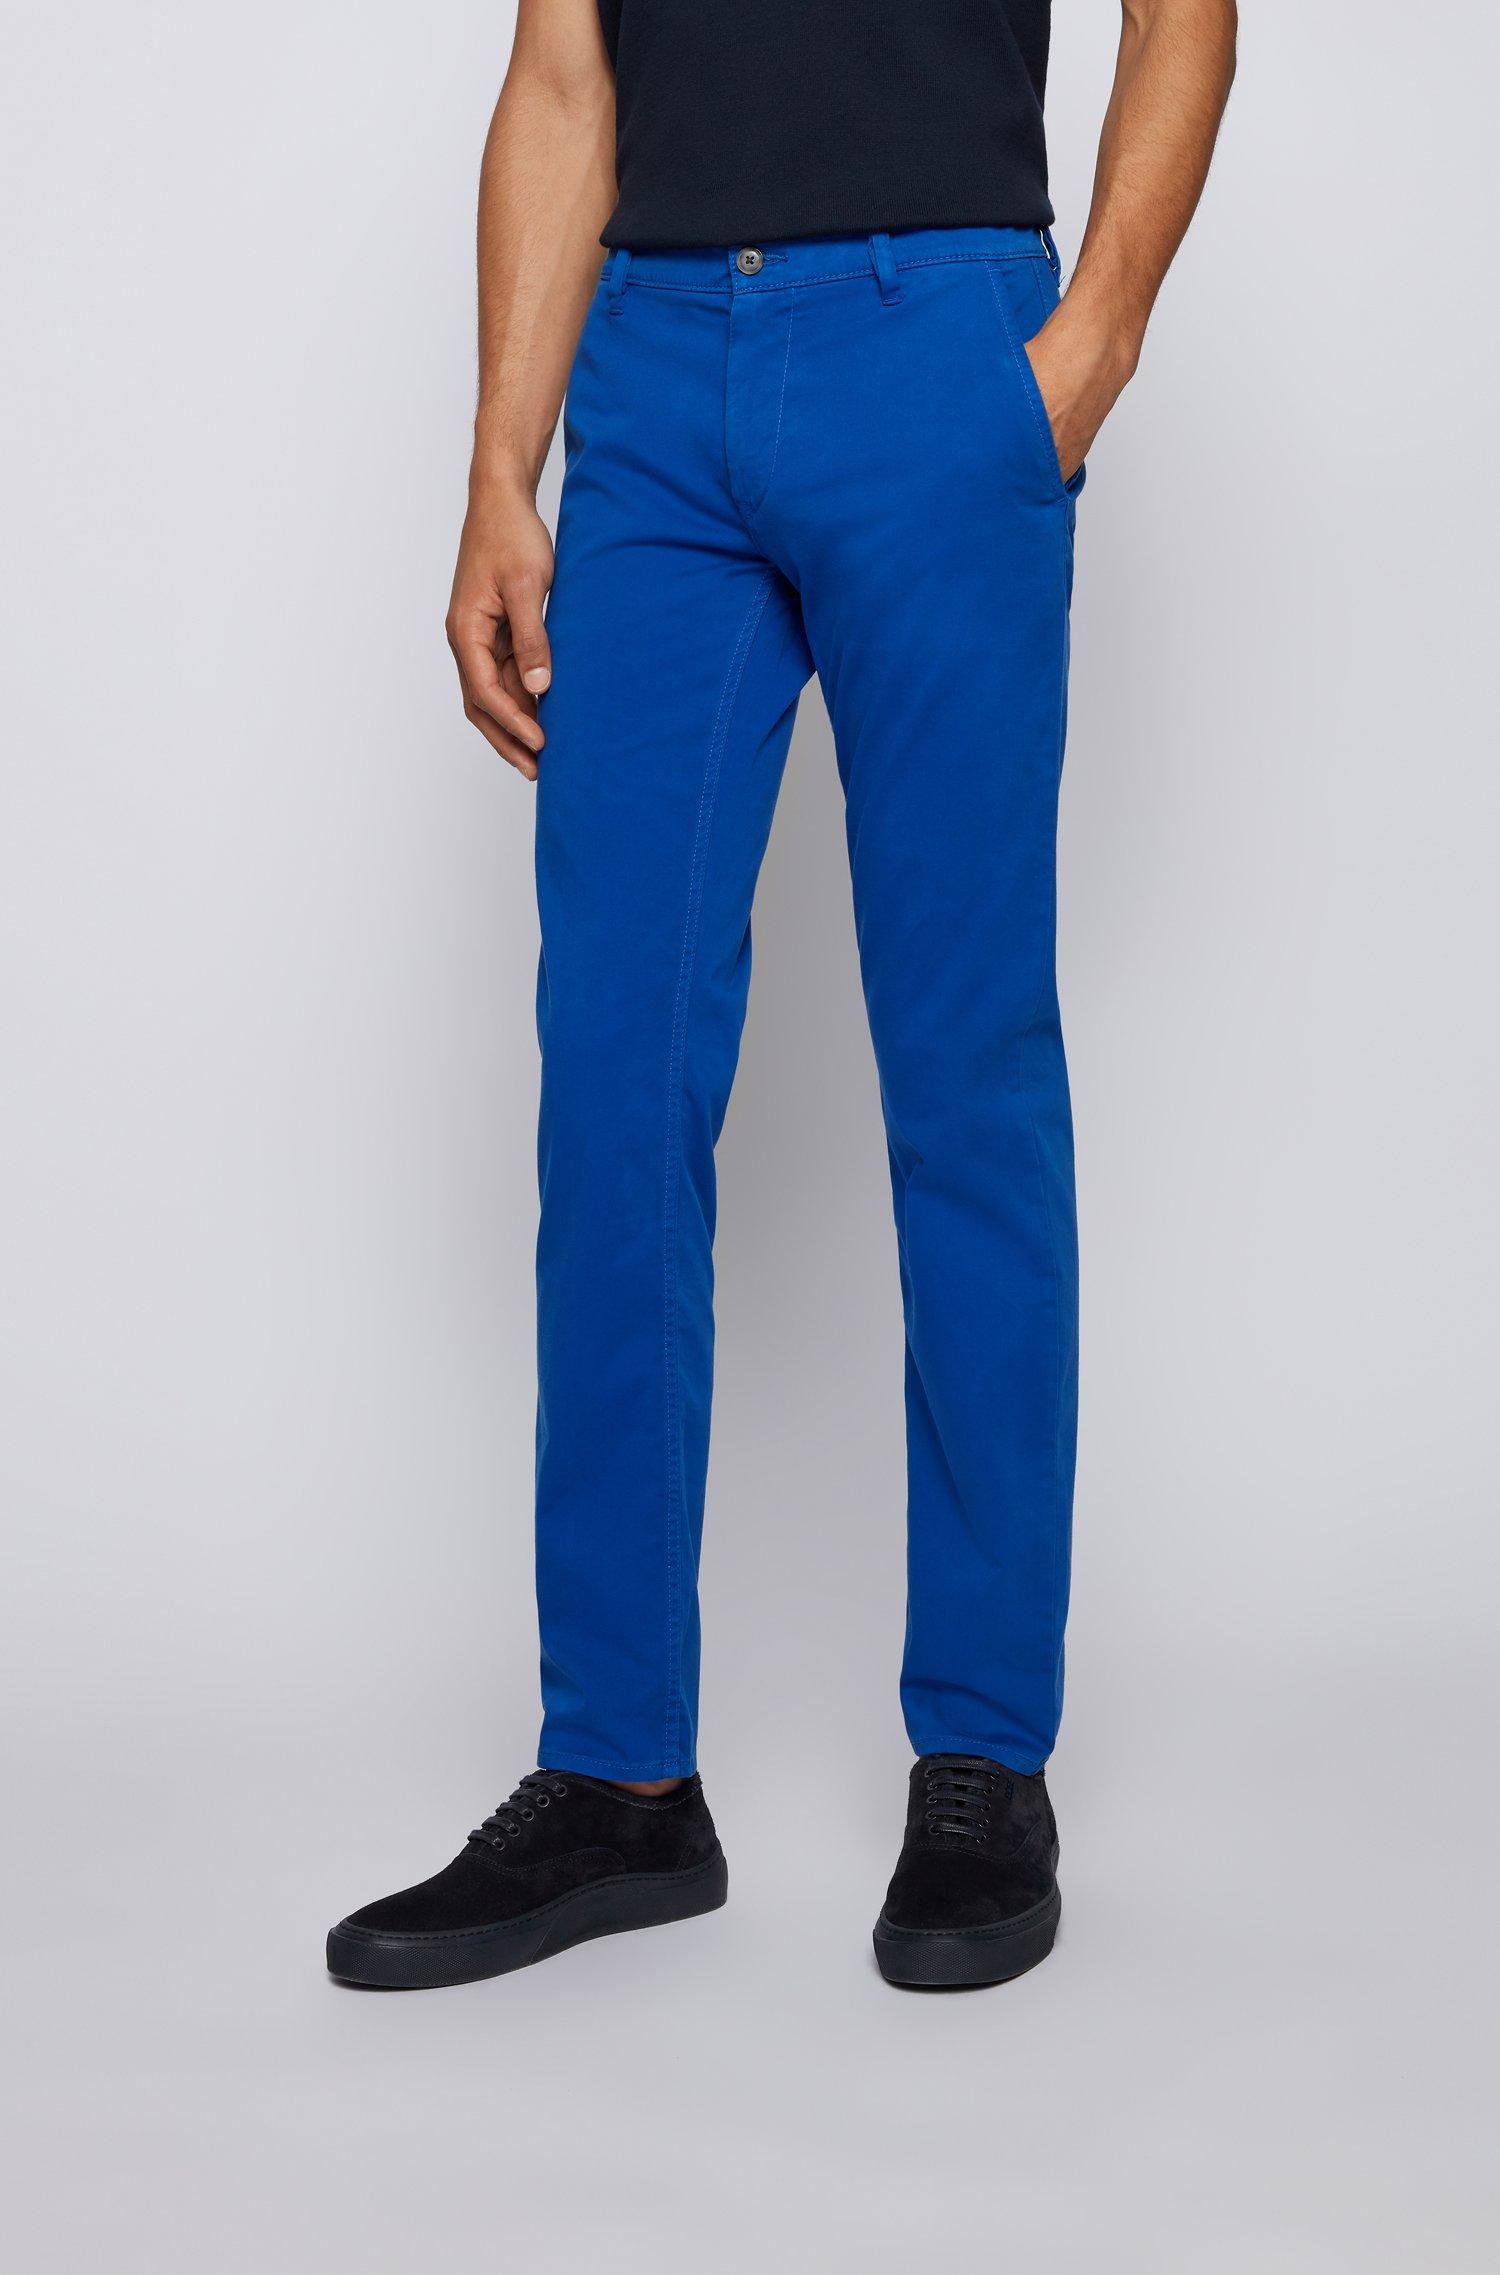 Chino casual Slim Fit en coton stretch brossé, Bleu